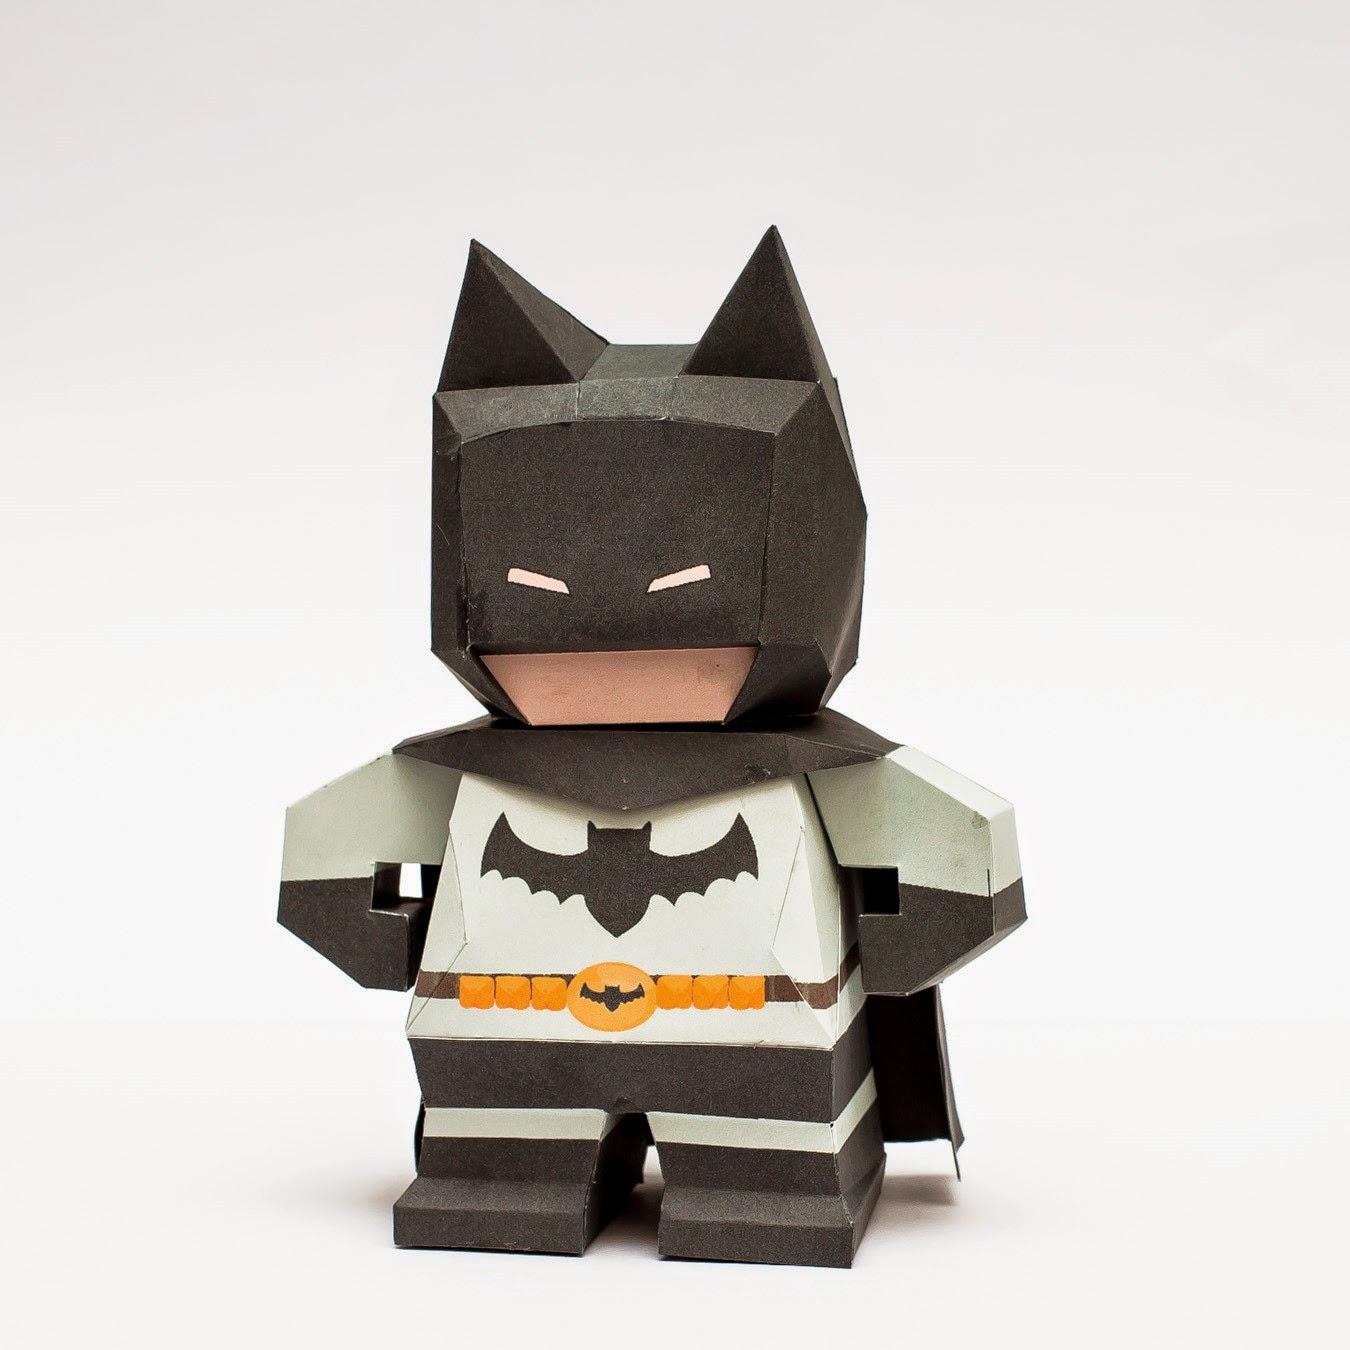 Chibi Batman Papercraft Model Mini